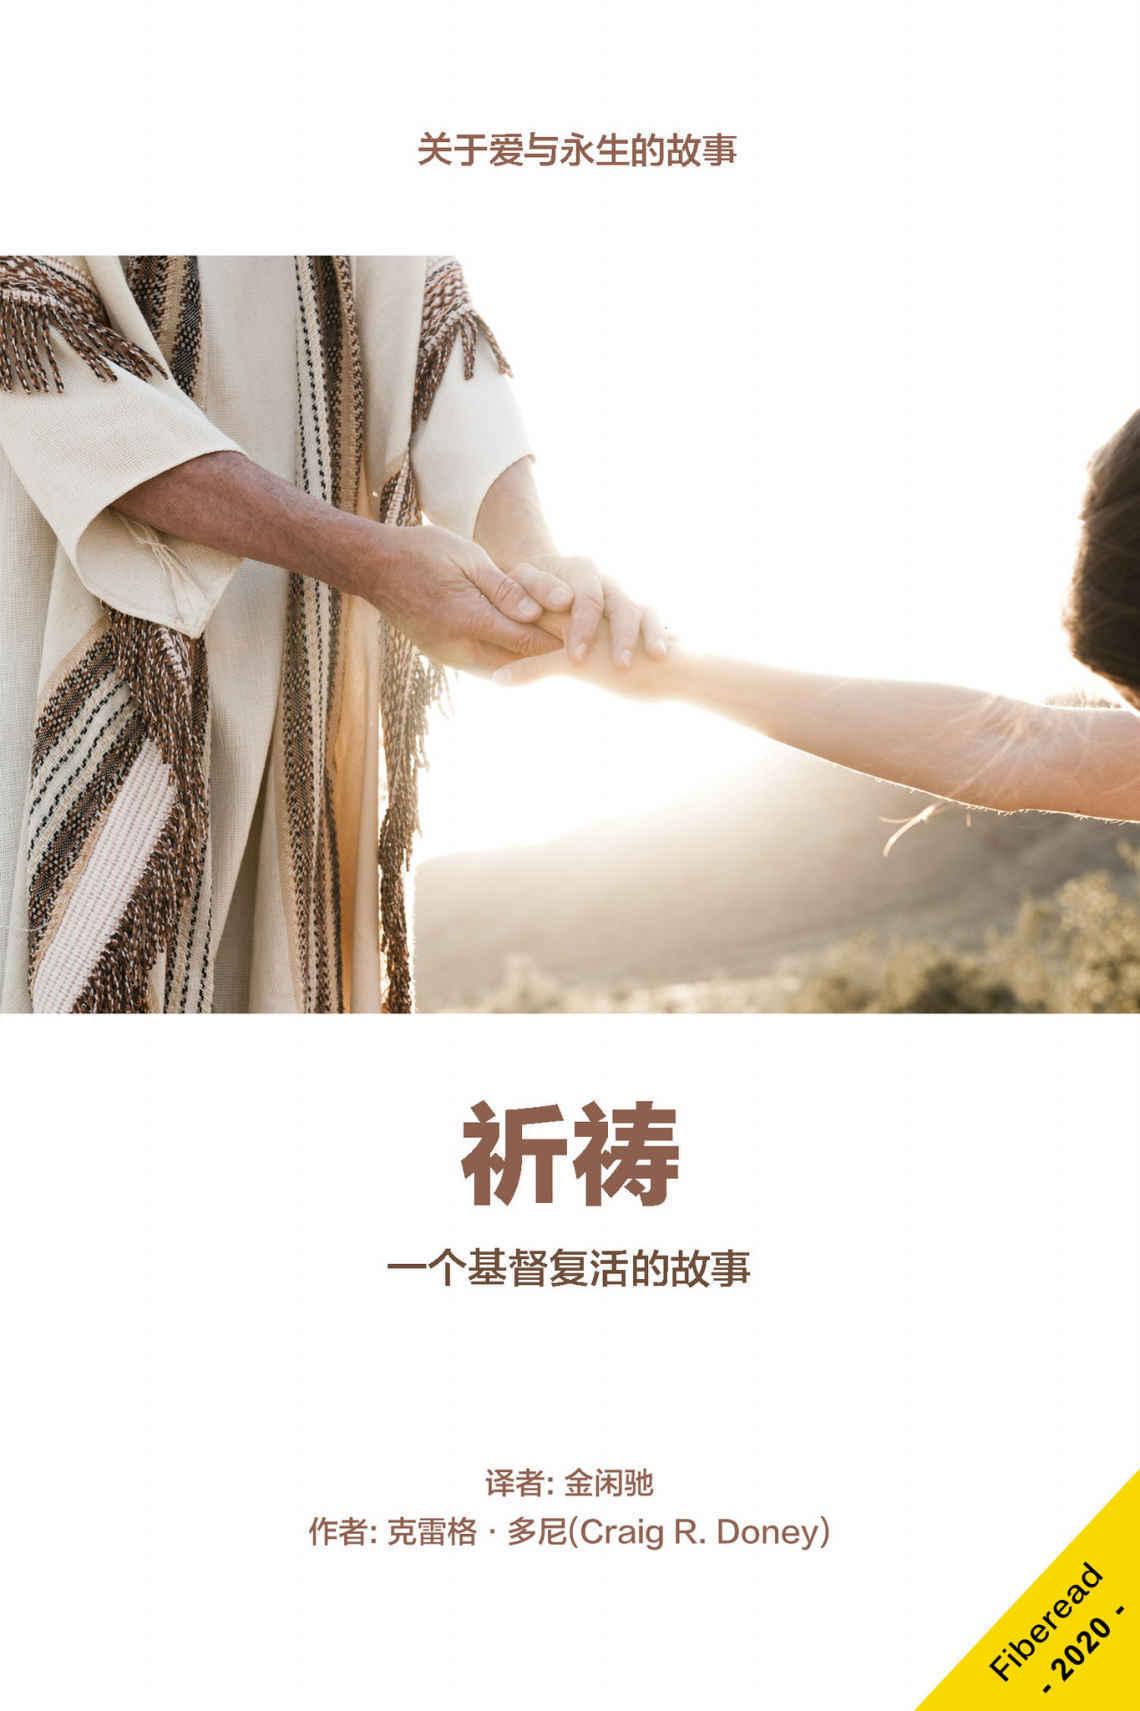 祈祷pdf-epub-mobi-txt-azw3